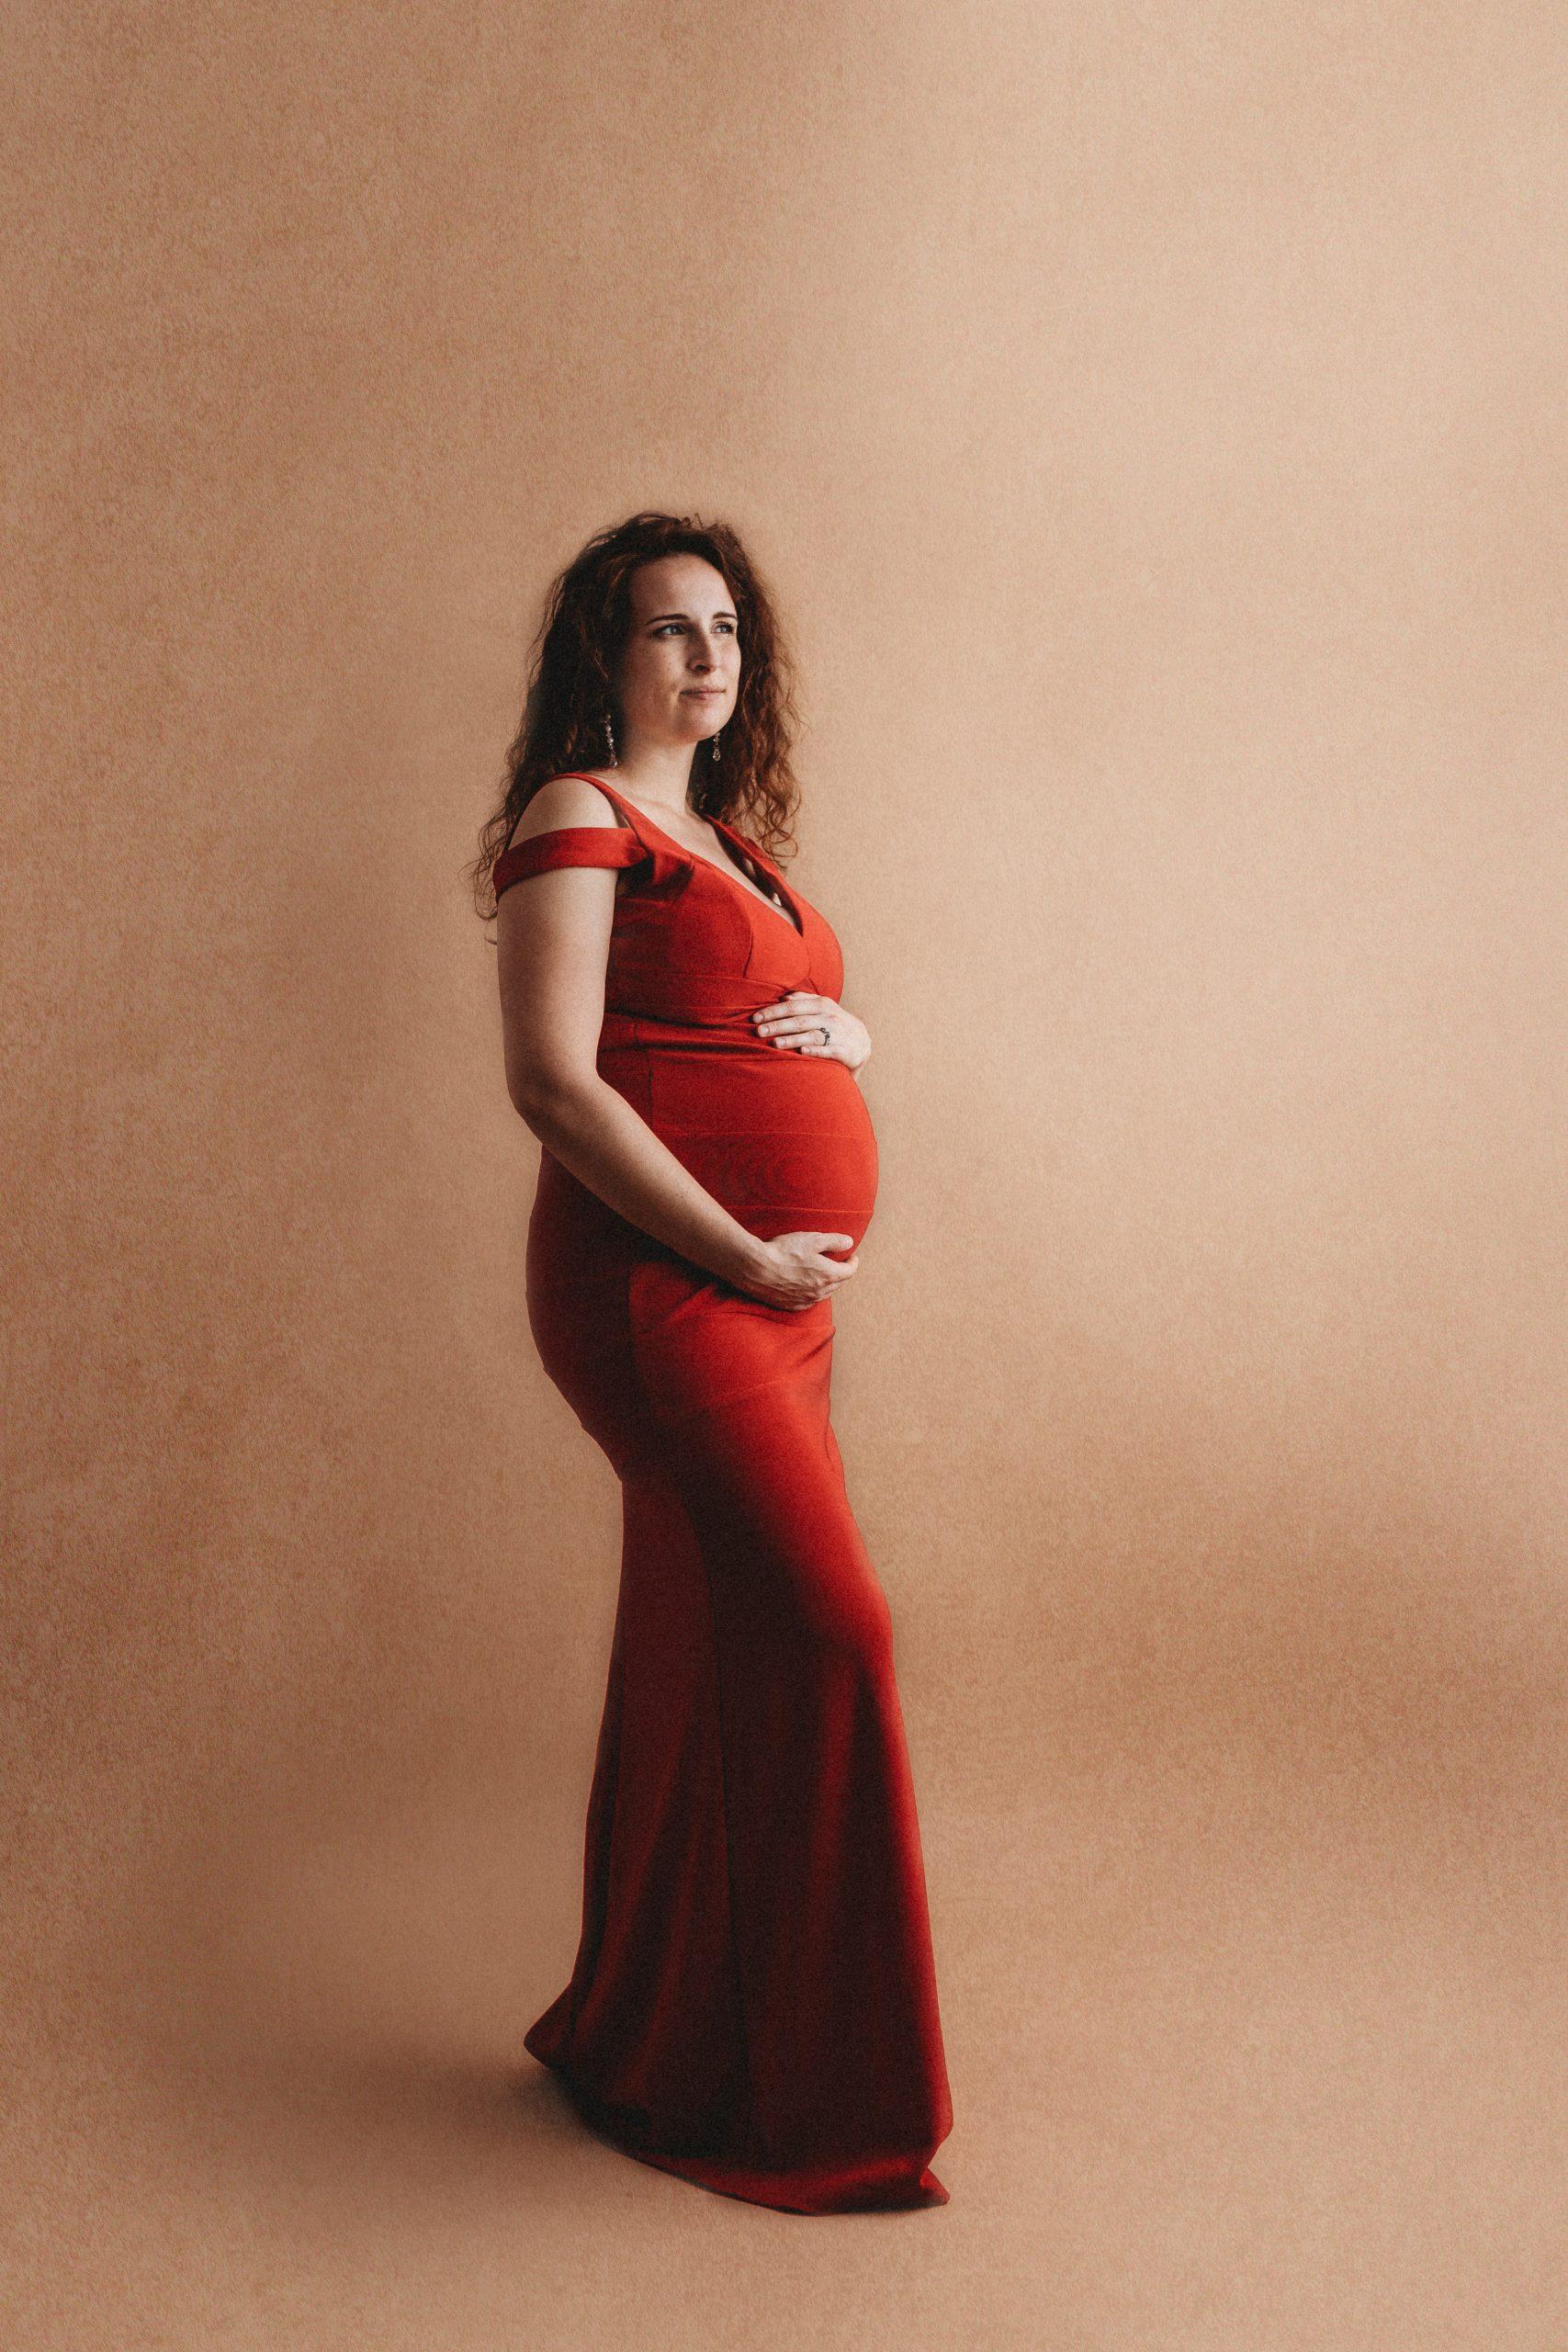 Indianapolis Indiana Studio Maternity Photographer